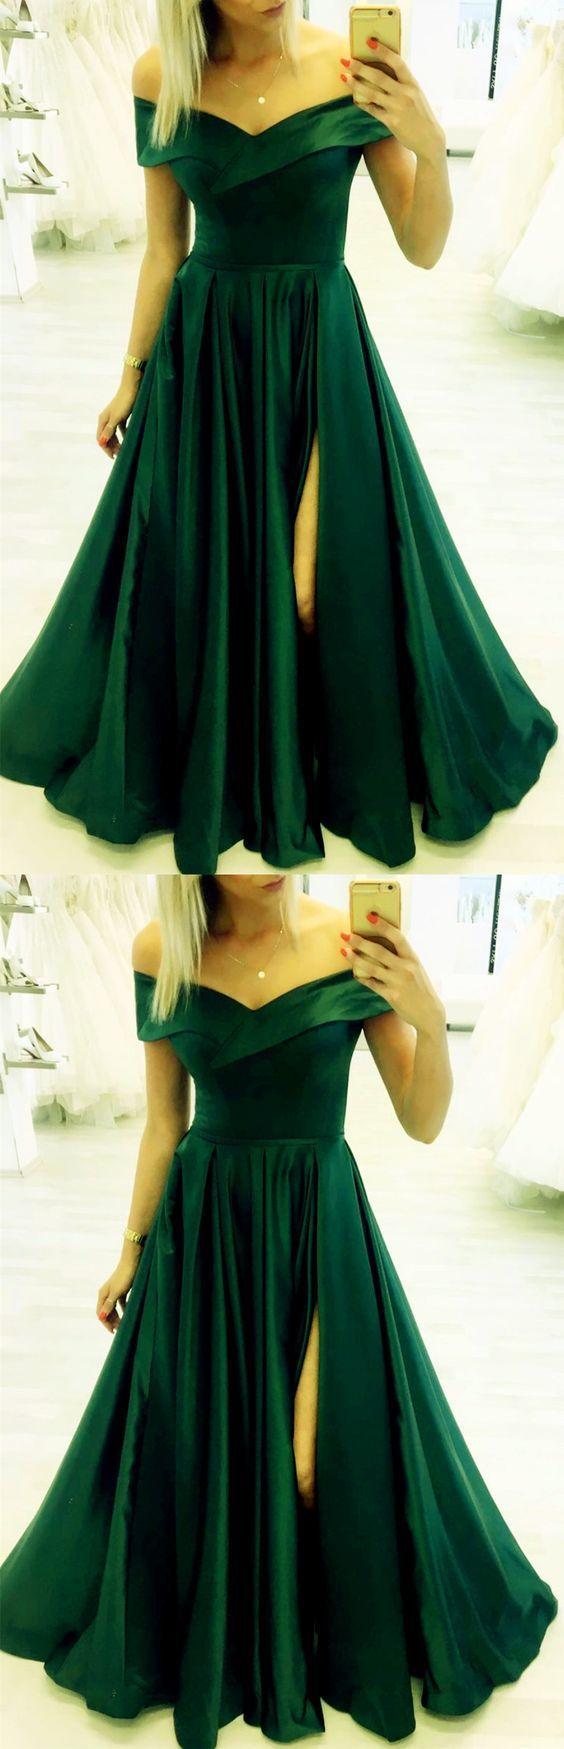 Gorgeous Satin Dresses With Off Shoulder And Leg Split Design